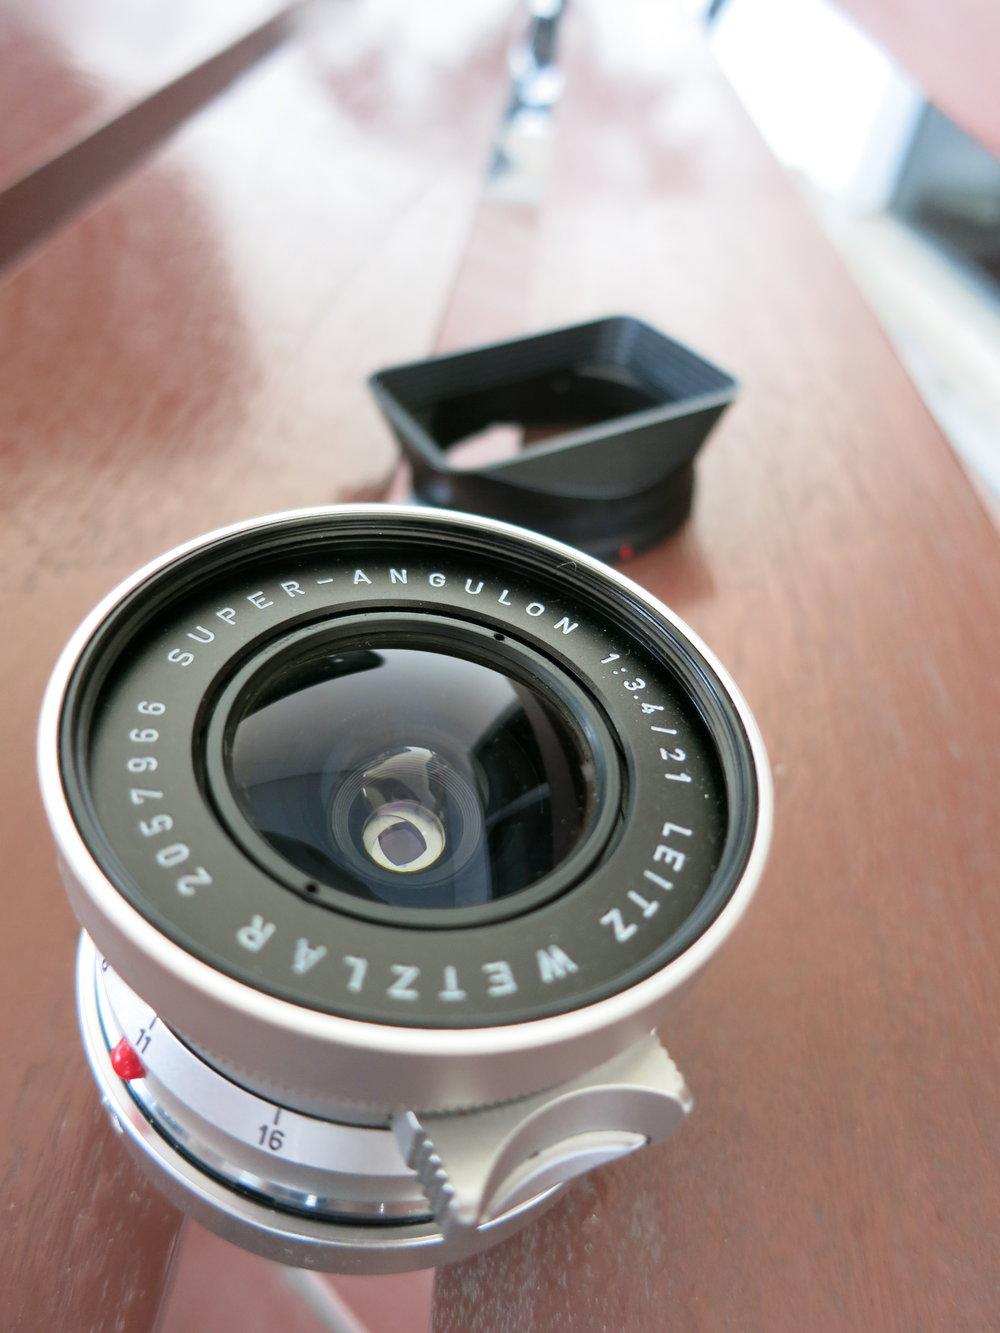 Chromacomaphoto Streetphotography Bangkok Thailand Leica 21mm super angulon sa 3 4 kodak tri x film (7).JPG